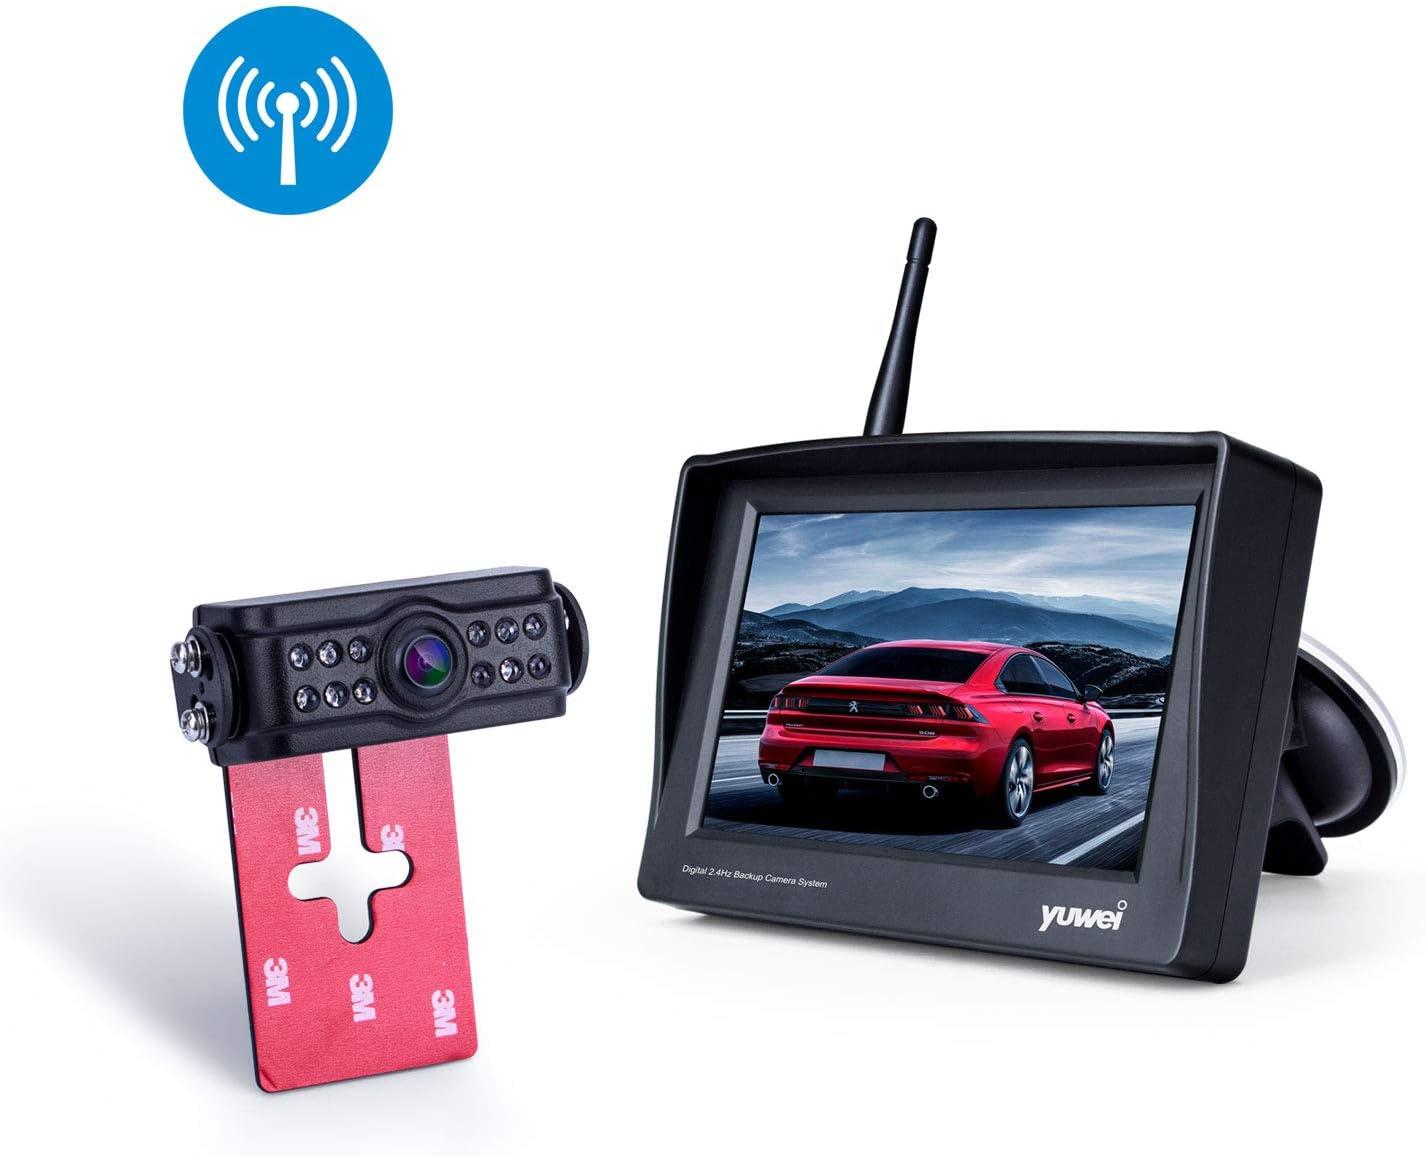 Minivans Pickups Camper Vans Cargo Vans,etc Sedans Yuwei Digital Wireless Backup Camera System with 4.3/'/' Wireless Reversing Monitor SUVs Stable Wireless Signal /& No Interference for Cars